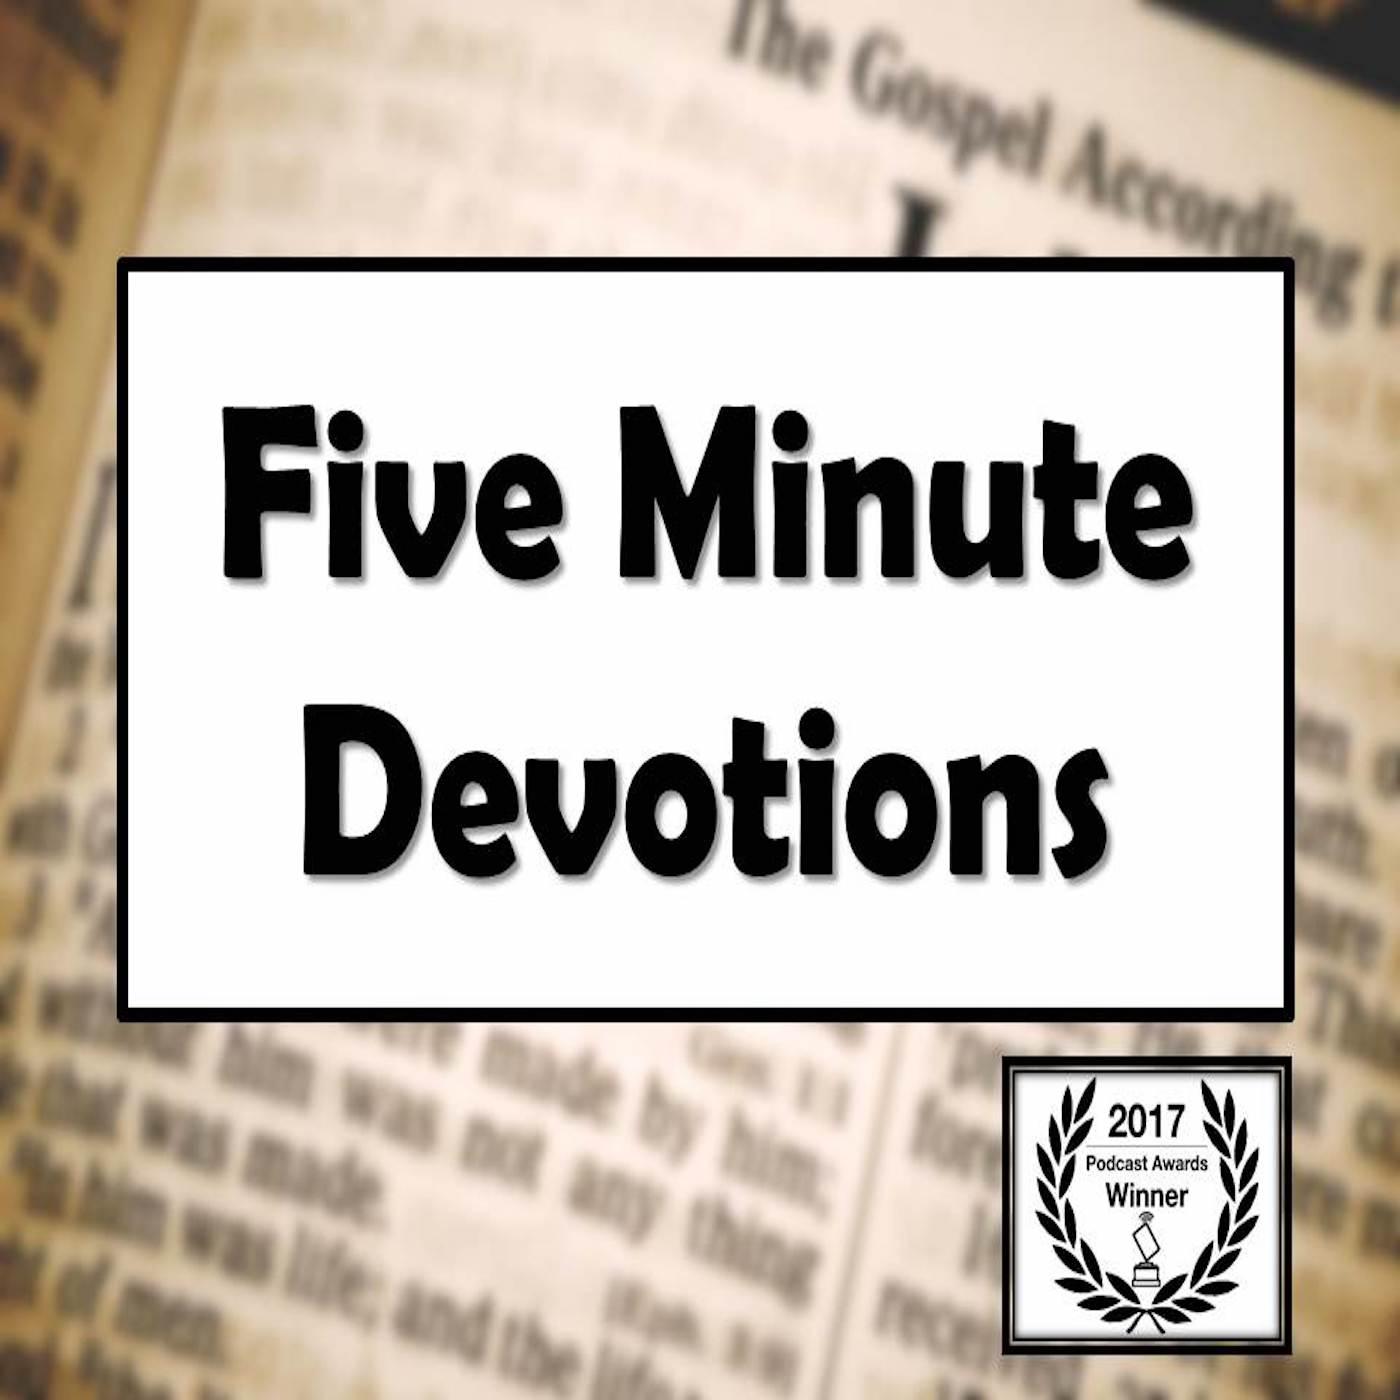 Five Minute Devotions